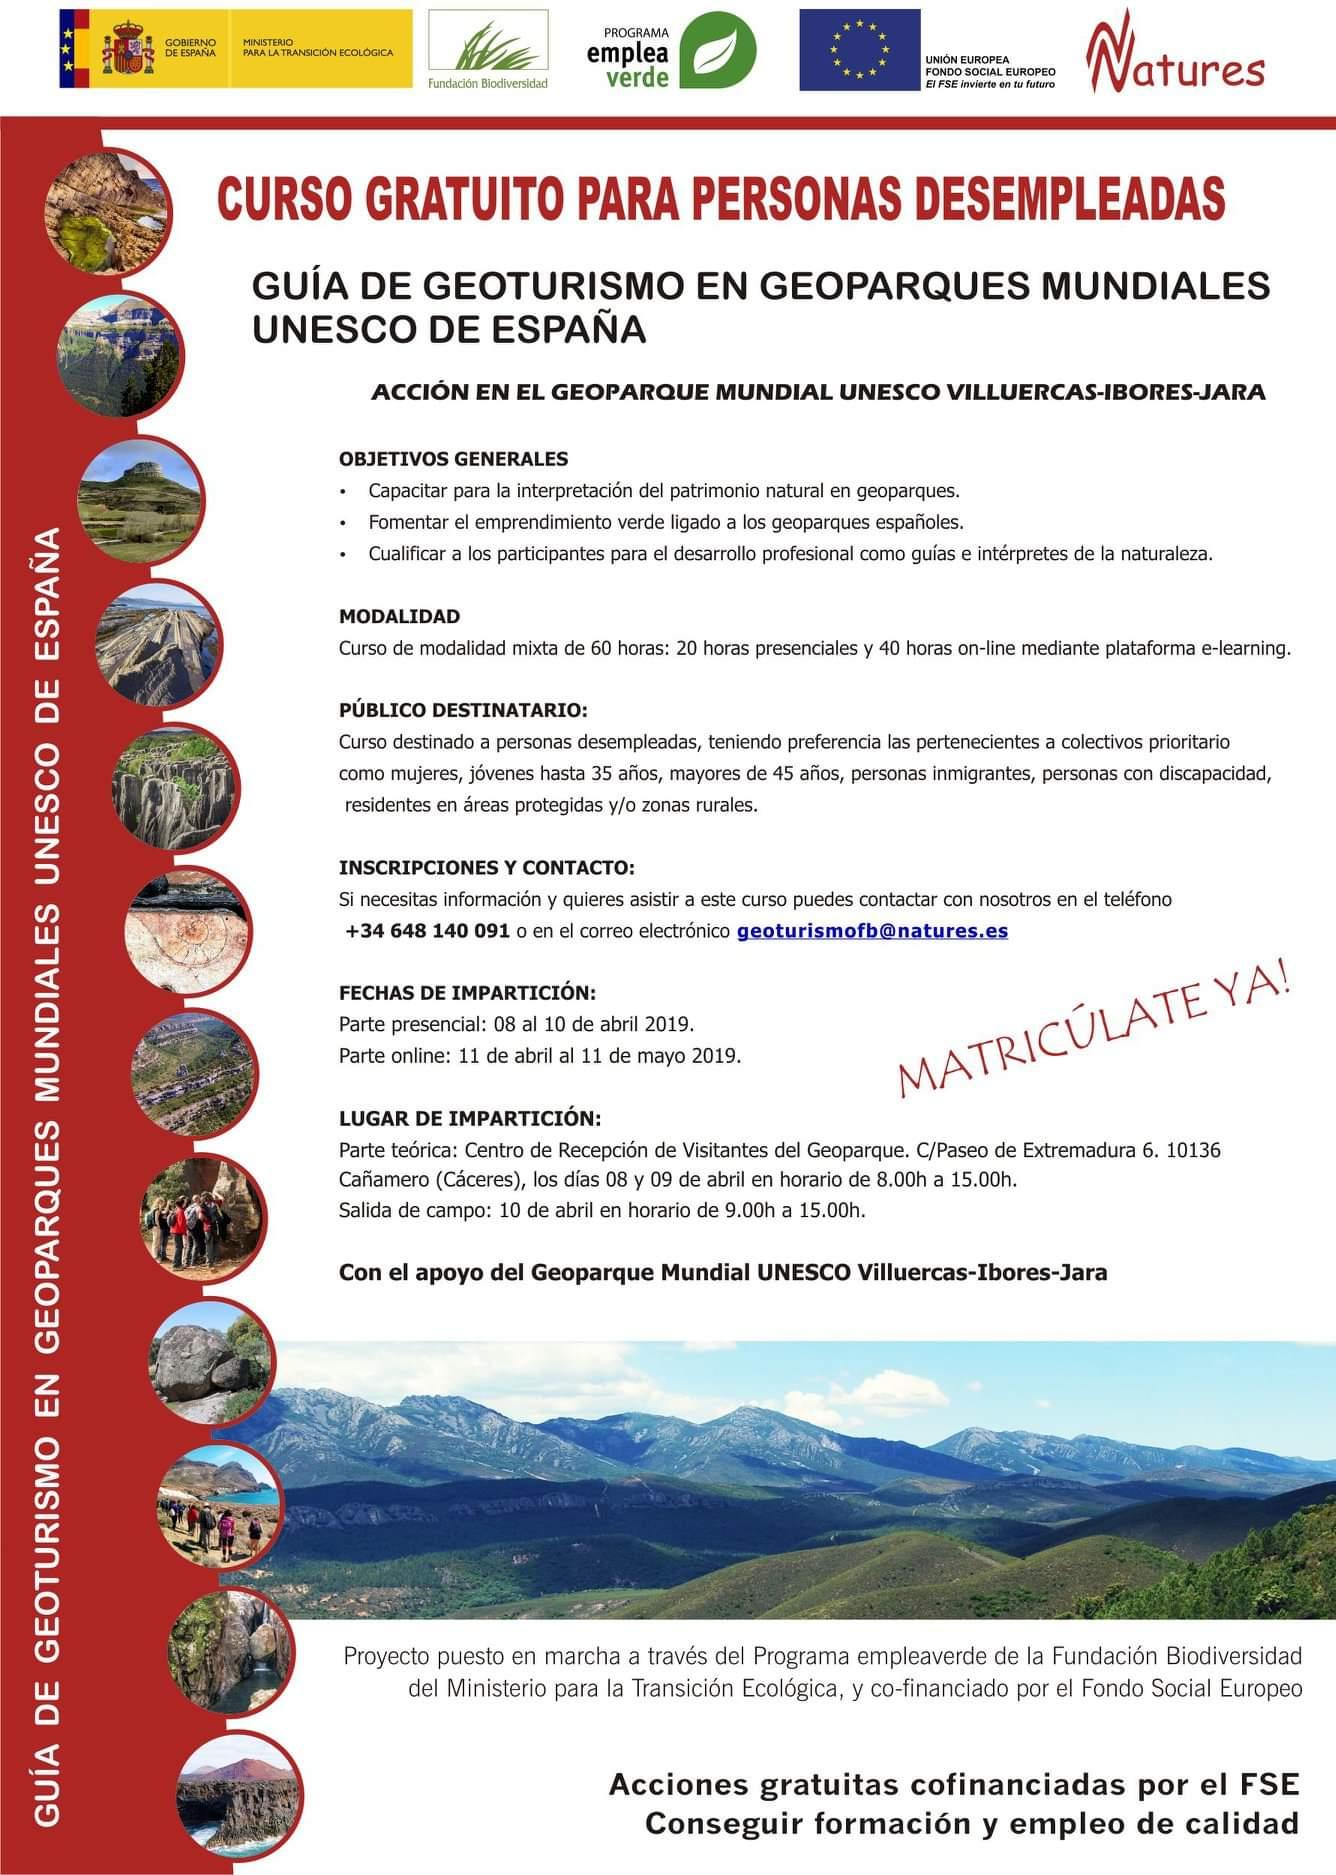 Curso de guía de geoturismo 2019 - Cañamero (Cáceres)